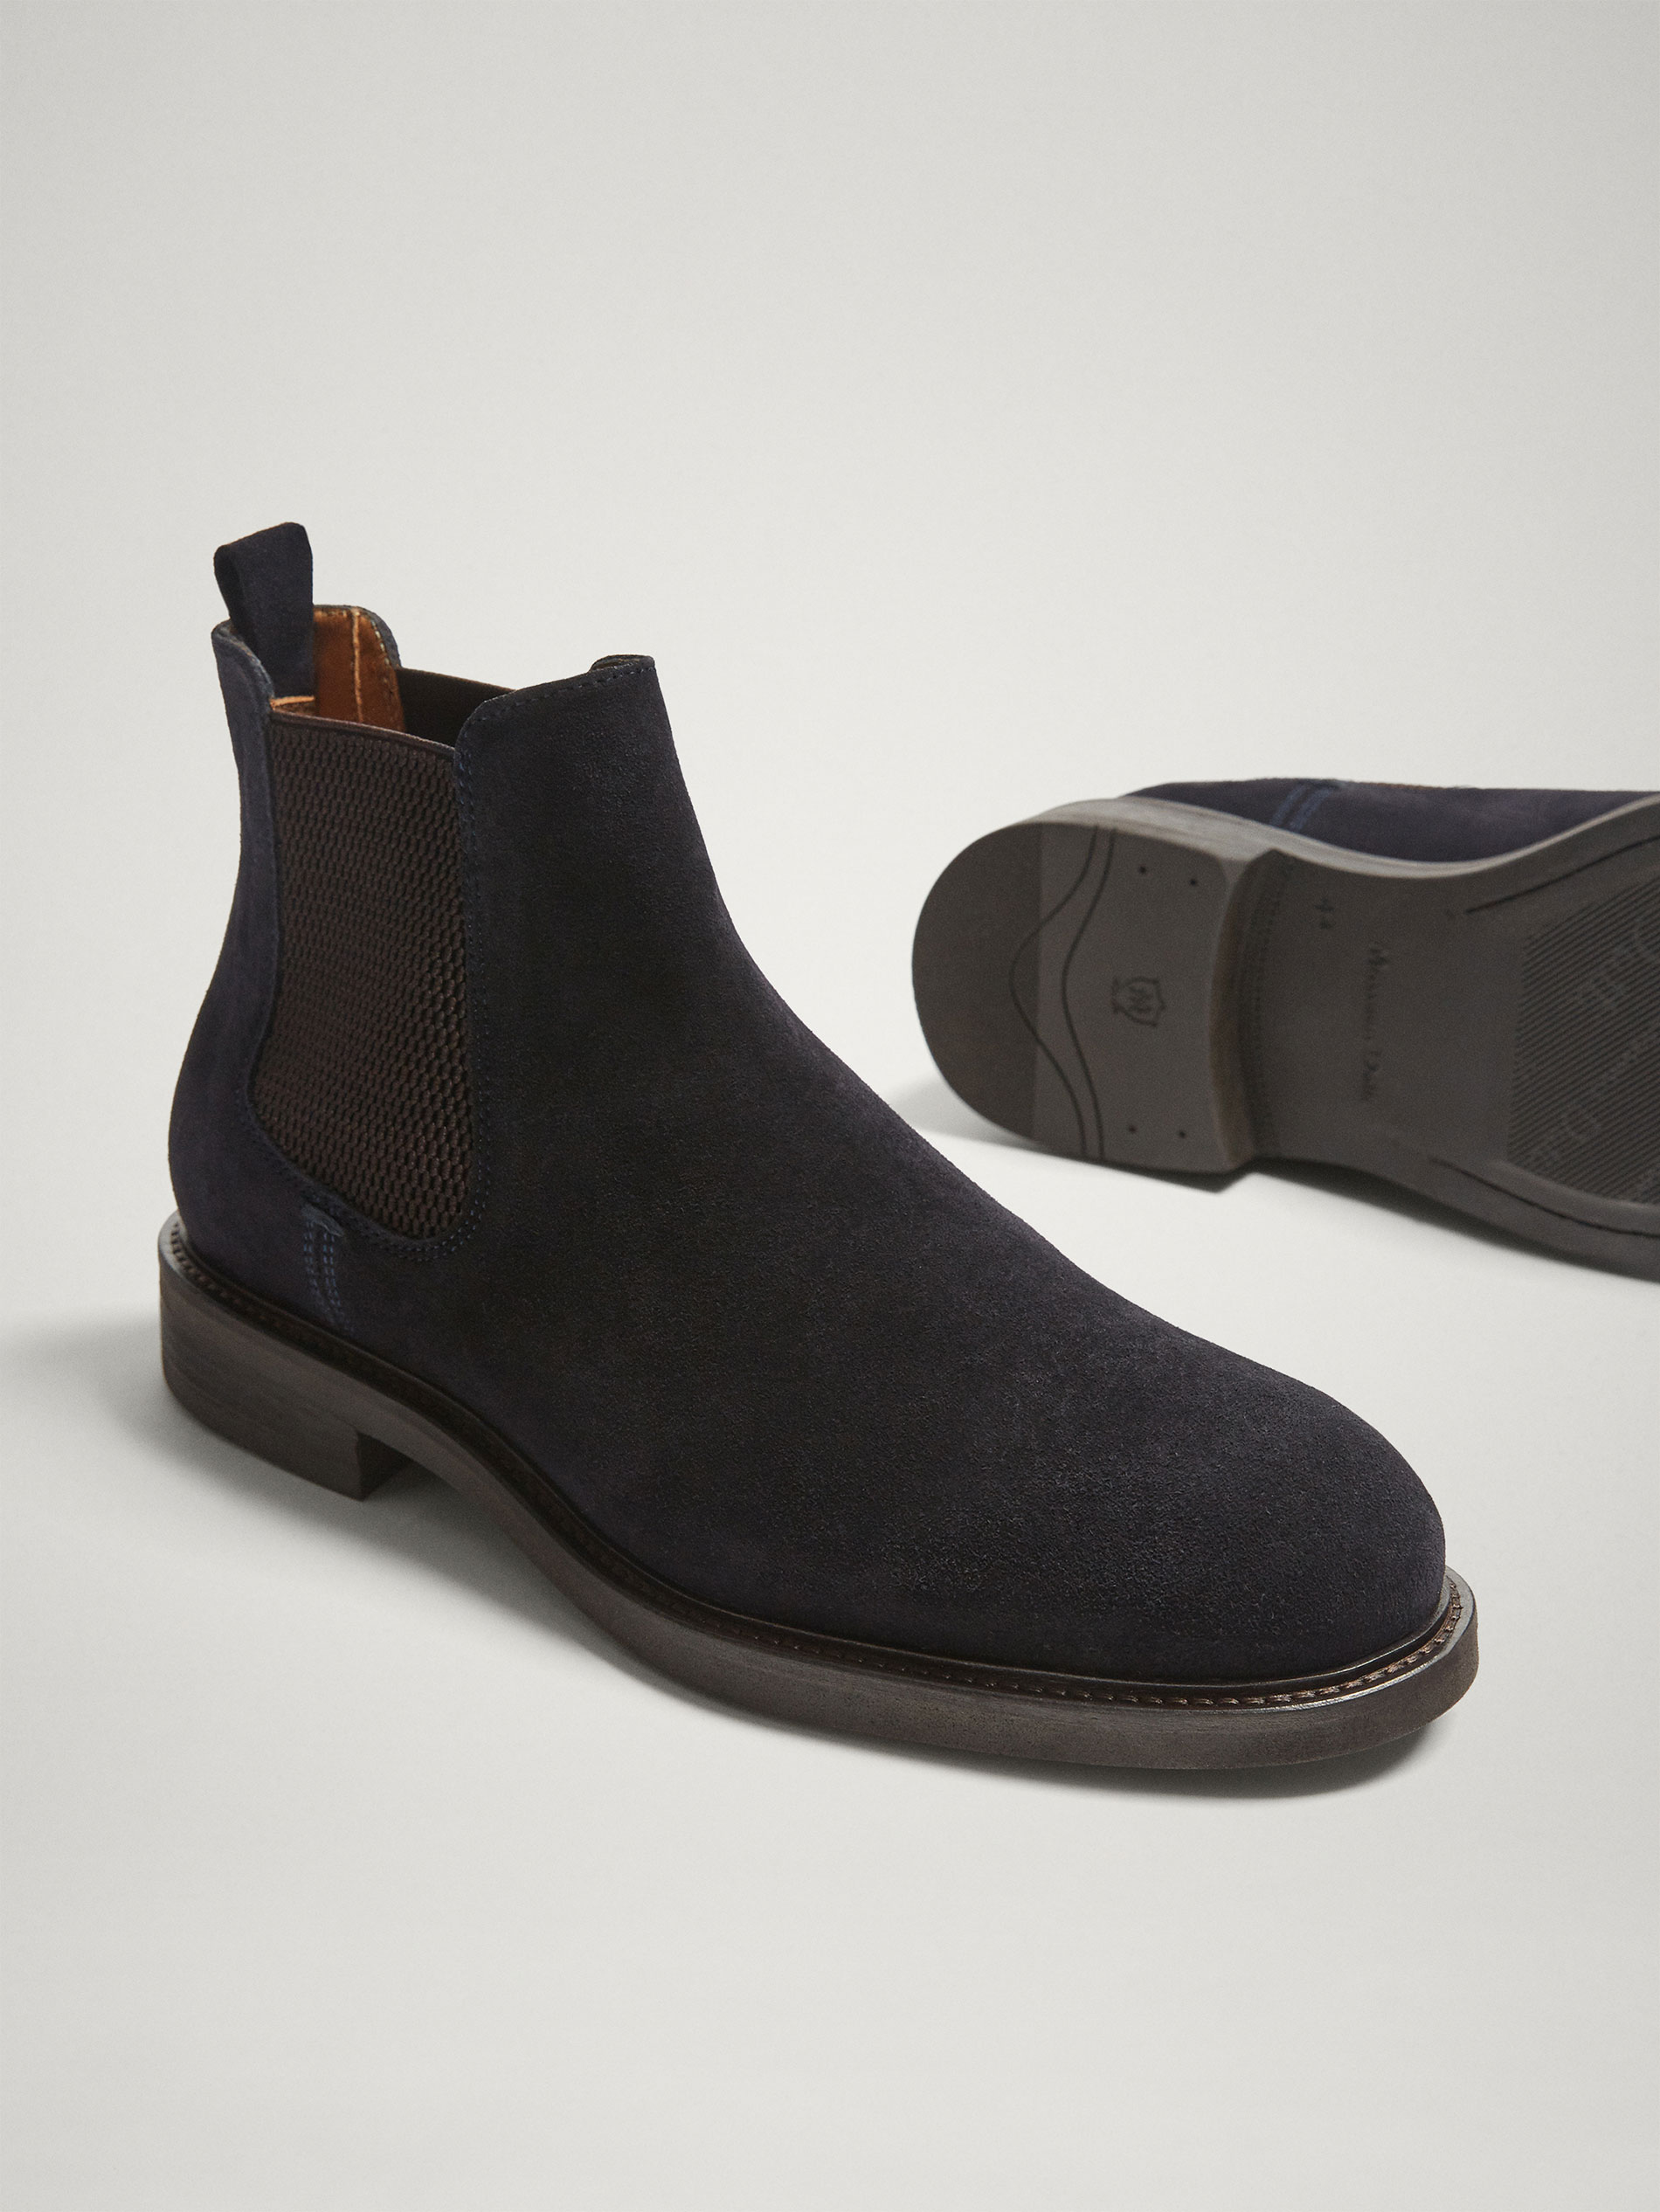 51588775252 Massimo Botas Zapatos Botines Hombre Y Dutti xURUFqIr